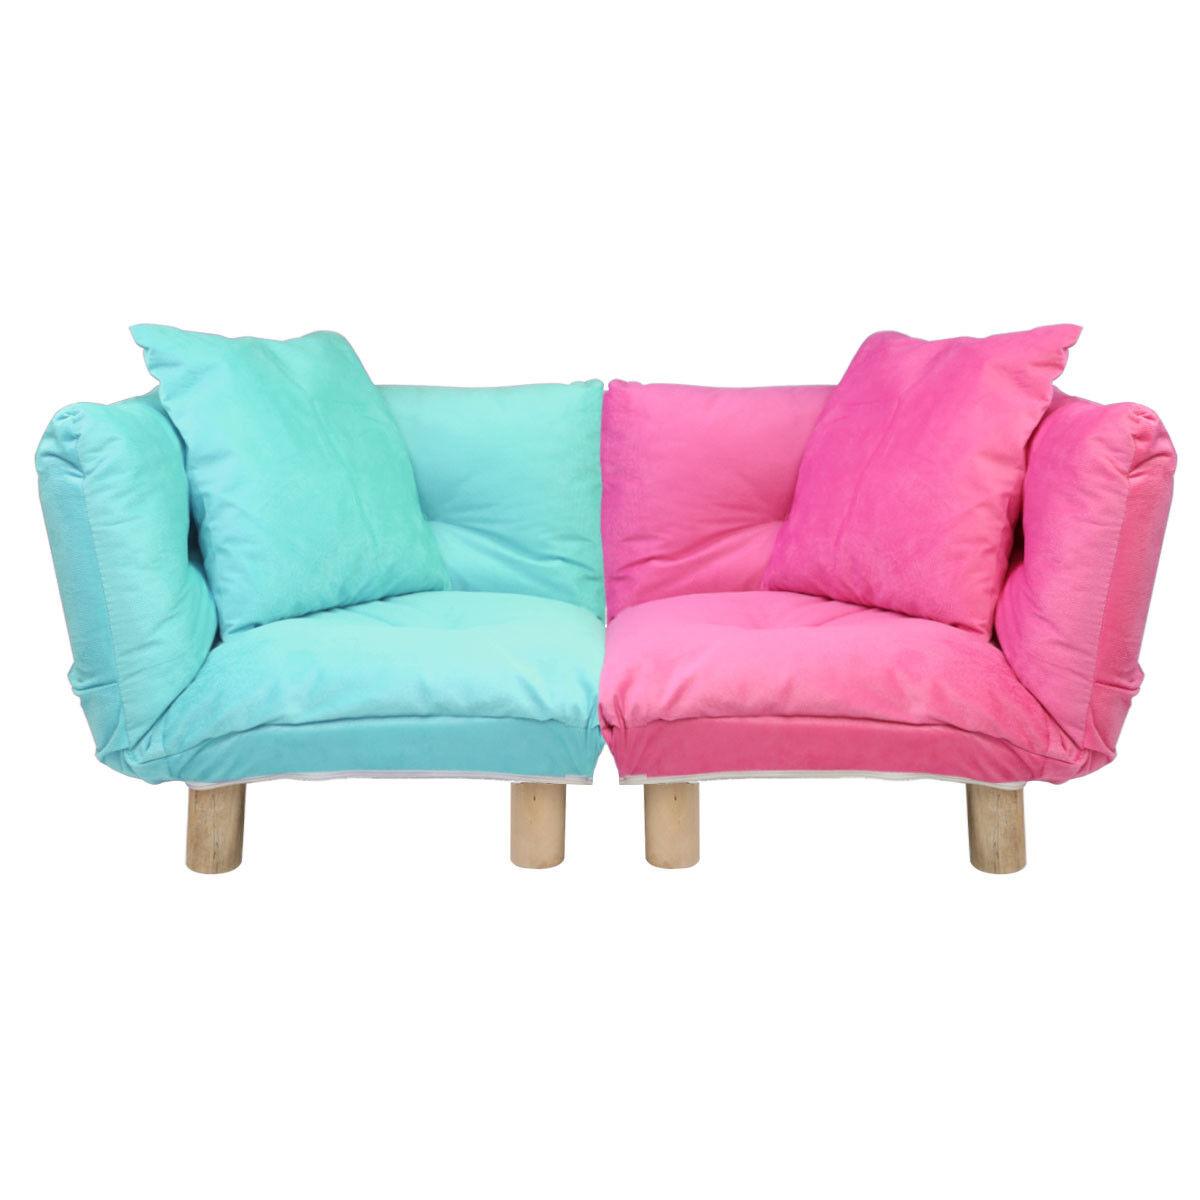 W Furniture: Corner Kid Sofa Children Furniture Floor Chair Lounge